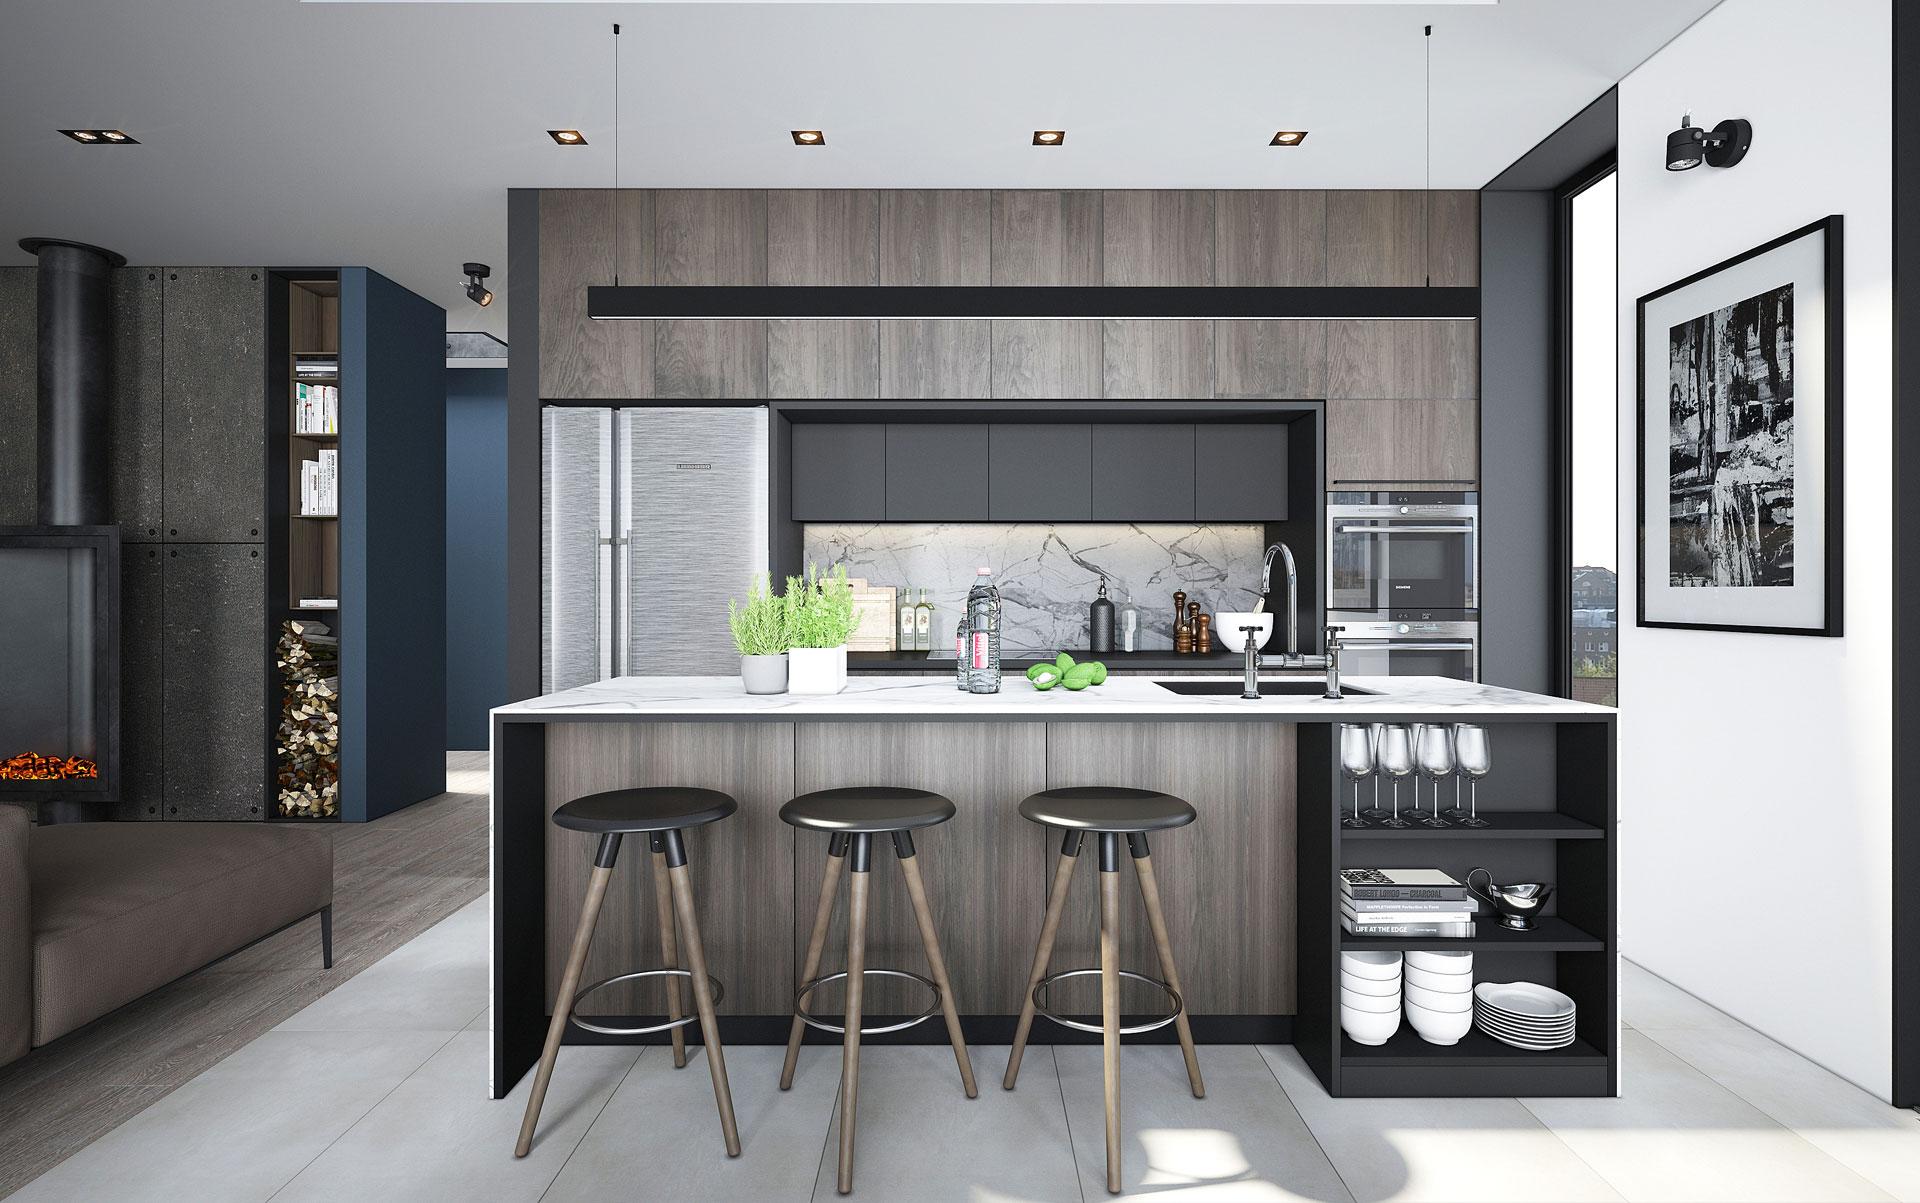 Интерьер в стиле «Soft loft» | Дизайн интерьера квартиры-студии в стиле лофт / Дортмунд, Германия /